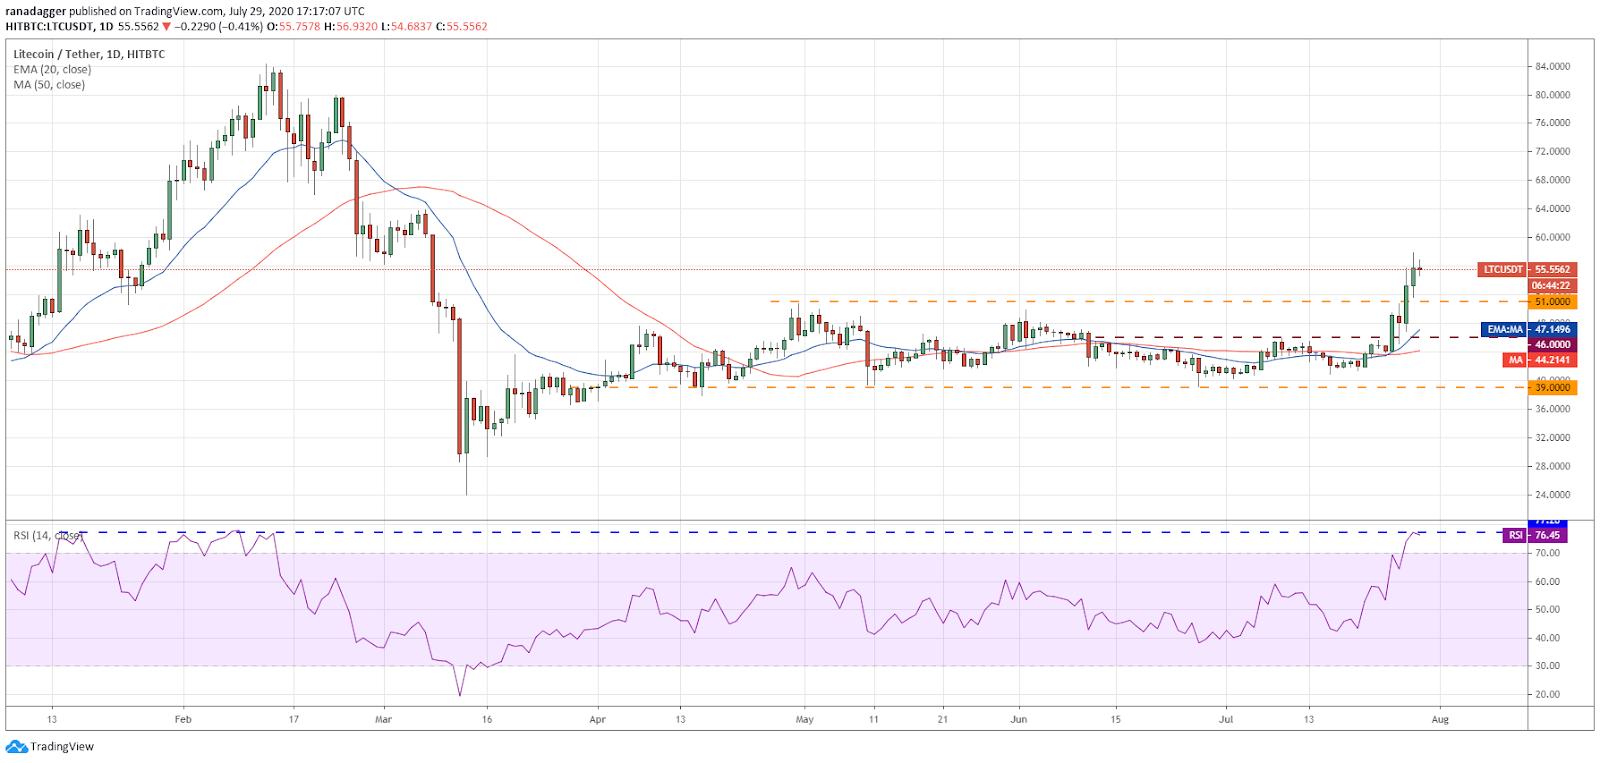 LTC/USD daily chart. Source: TradingView